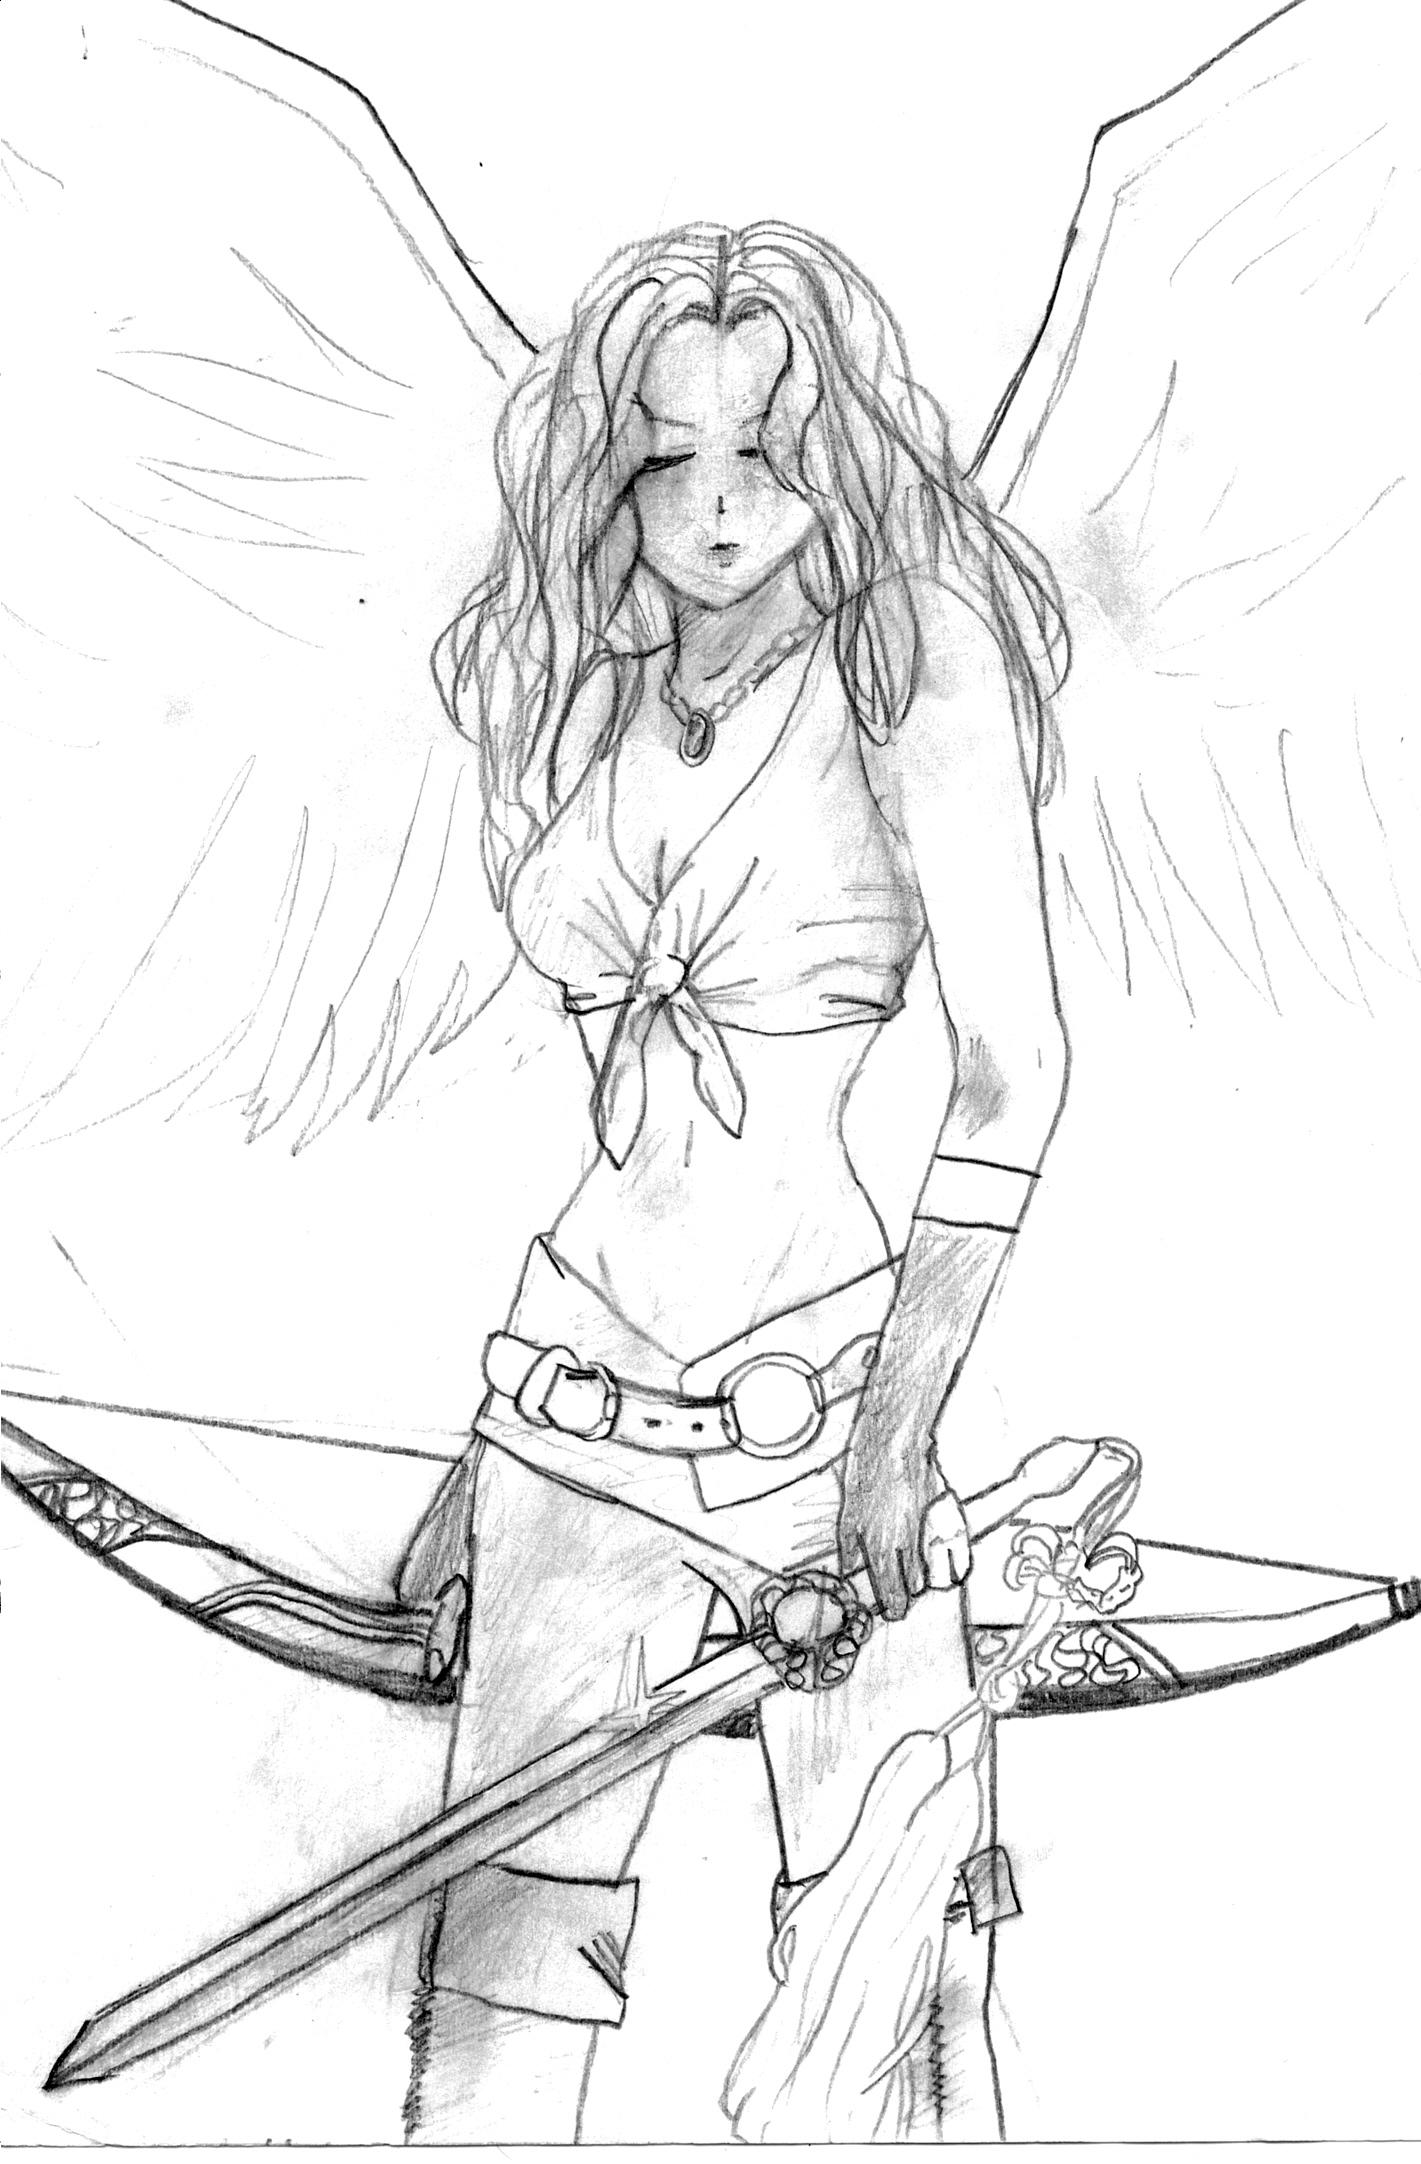 Drawn warrior cyclop Drawing Girl Warrior Girl Warrior